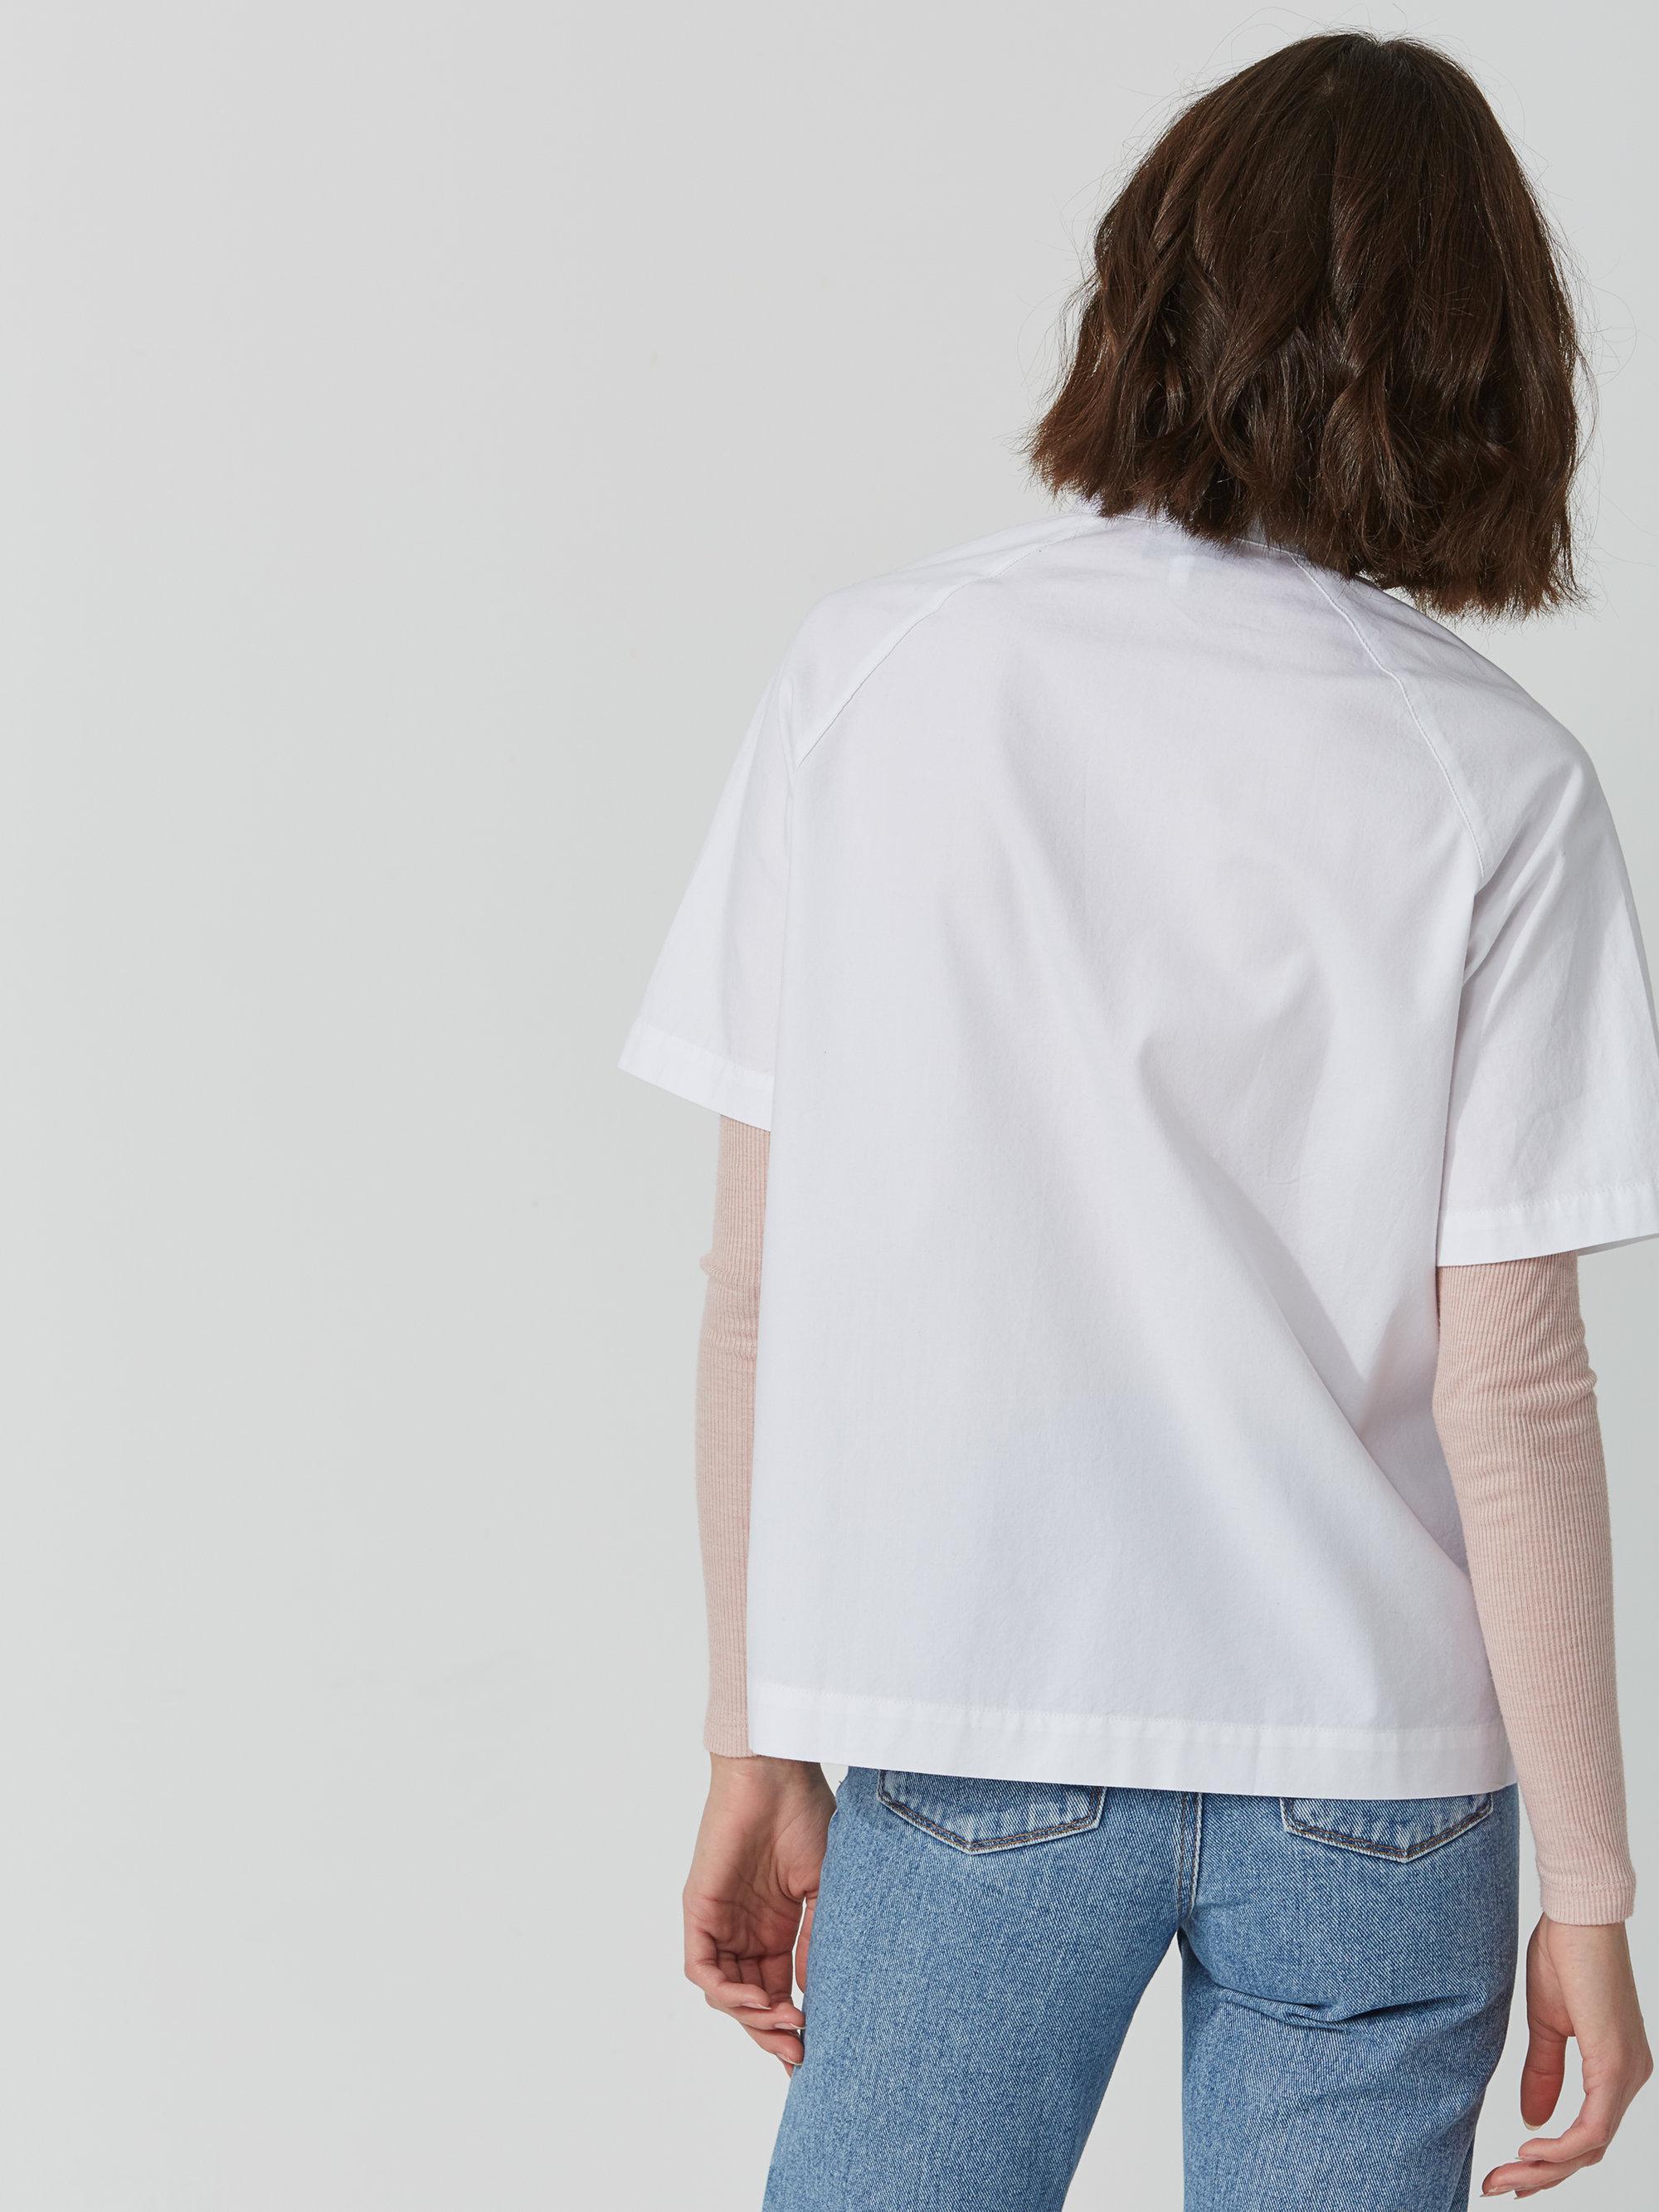 Frank and oak midi oxford shirt in bright white in white for Frank and oak shirt